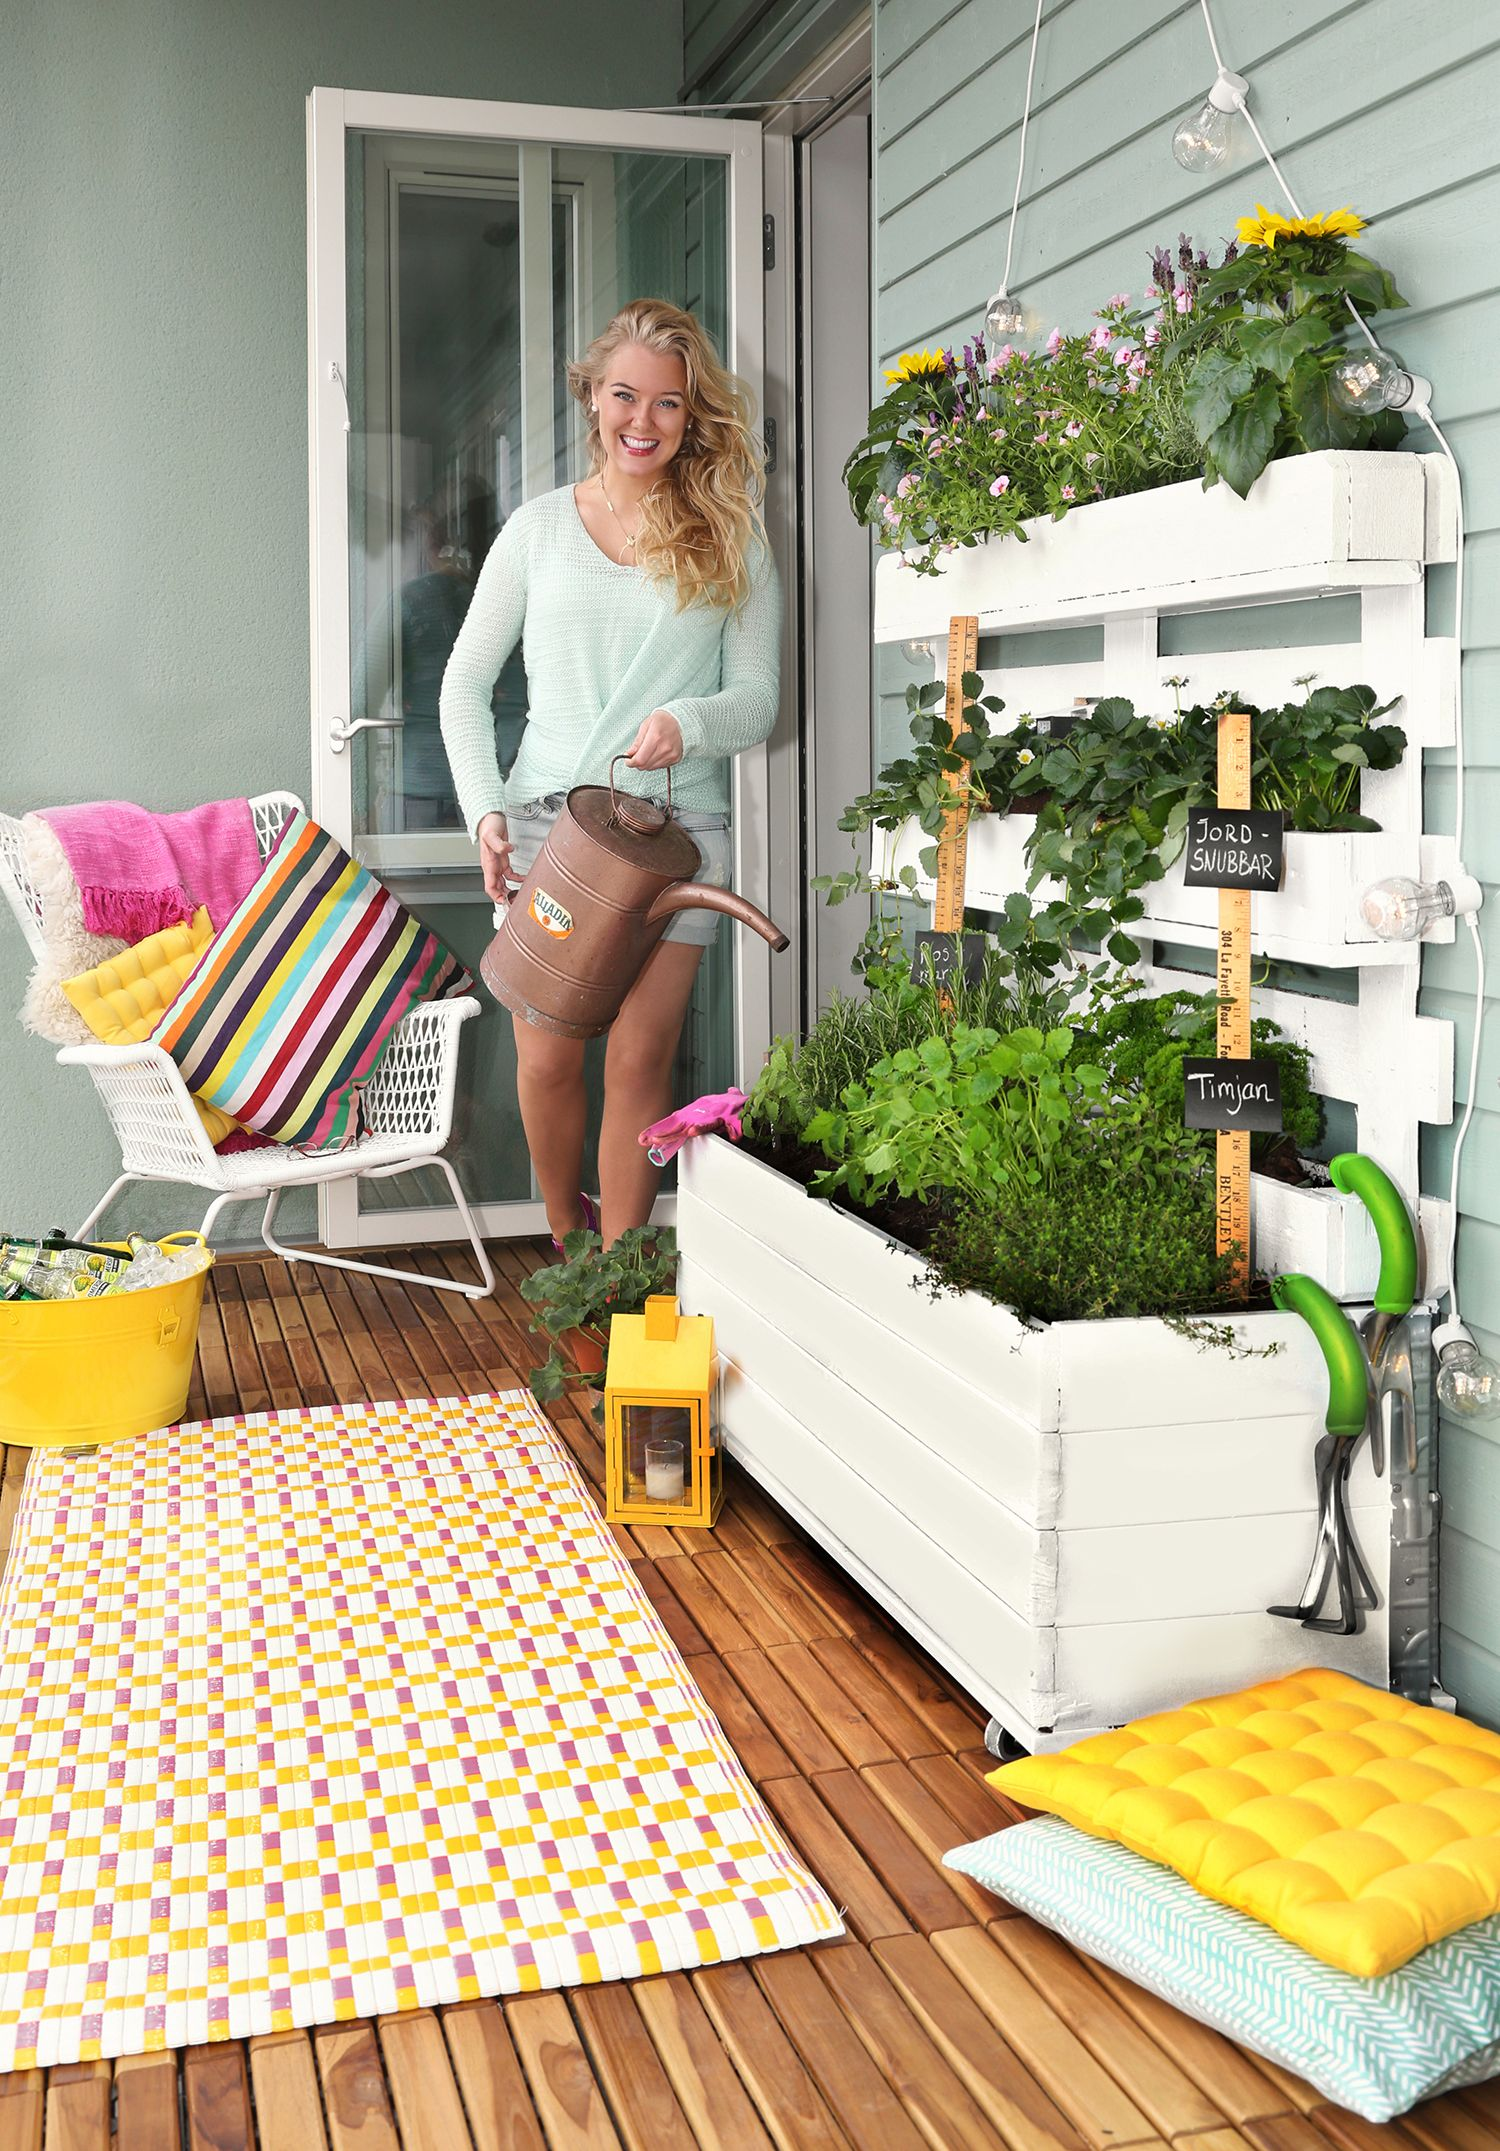 1000+ images about Claras balkonger och inredning on Pinterest ...